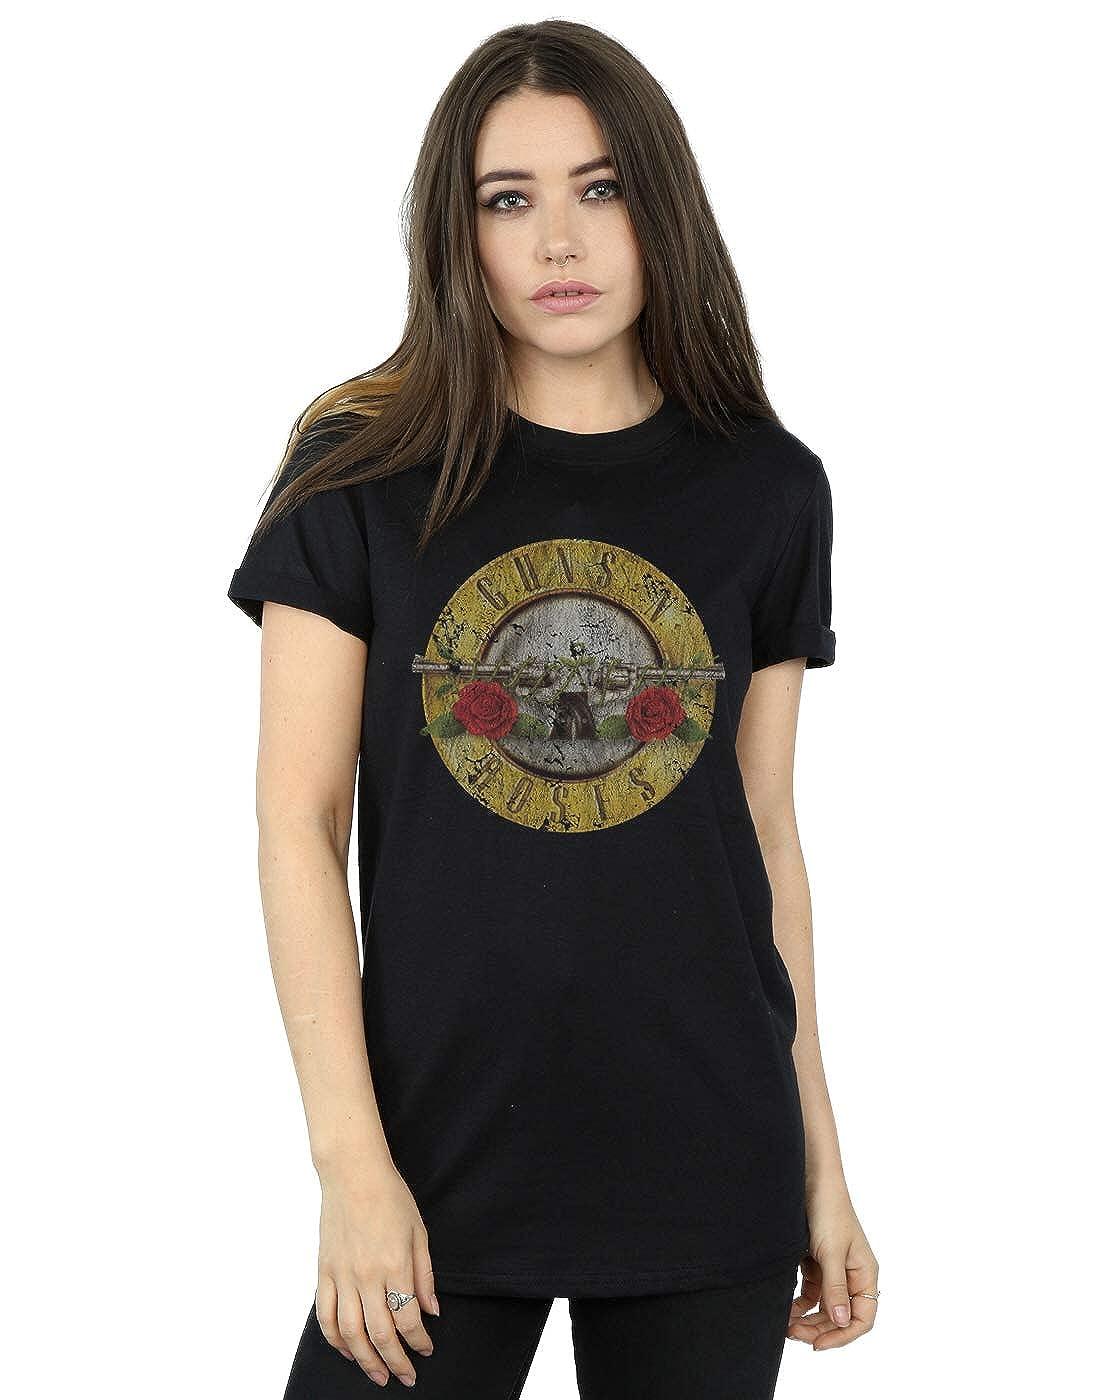 Guns N Roses Mujer Vintage Bullet Logo Camiseta del Novio Fit